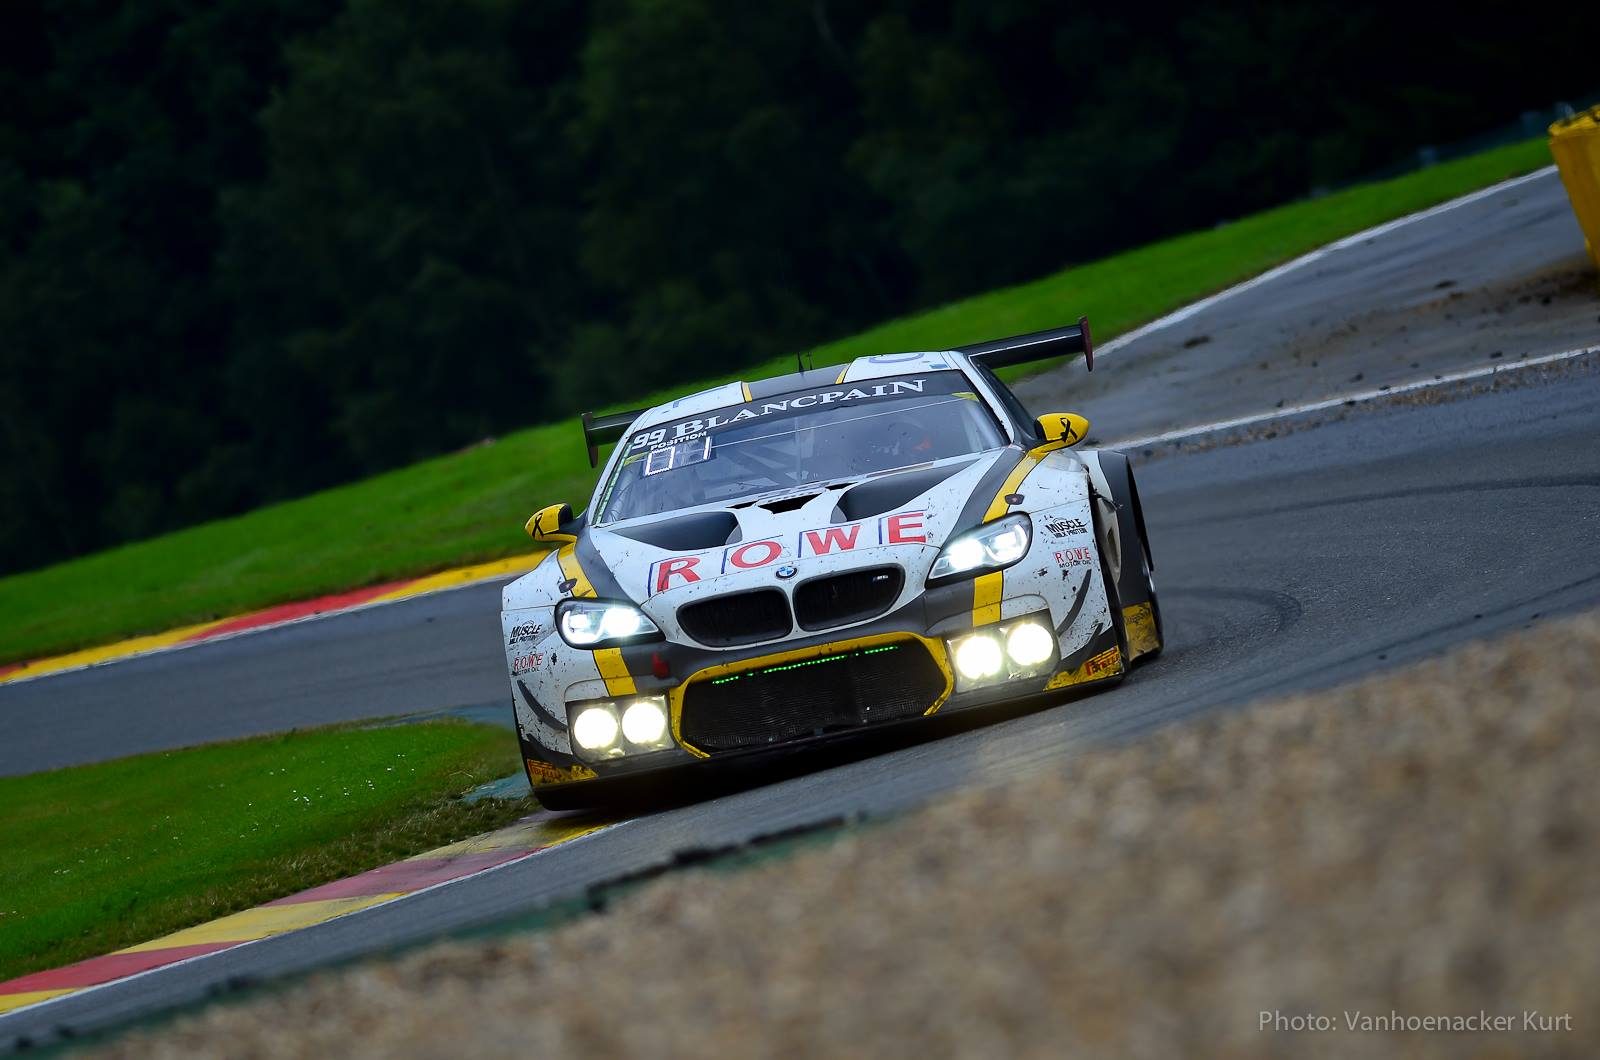 BMW 6 Rowe Racing